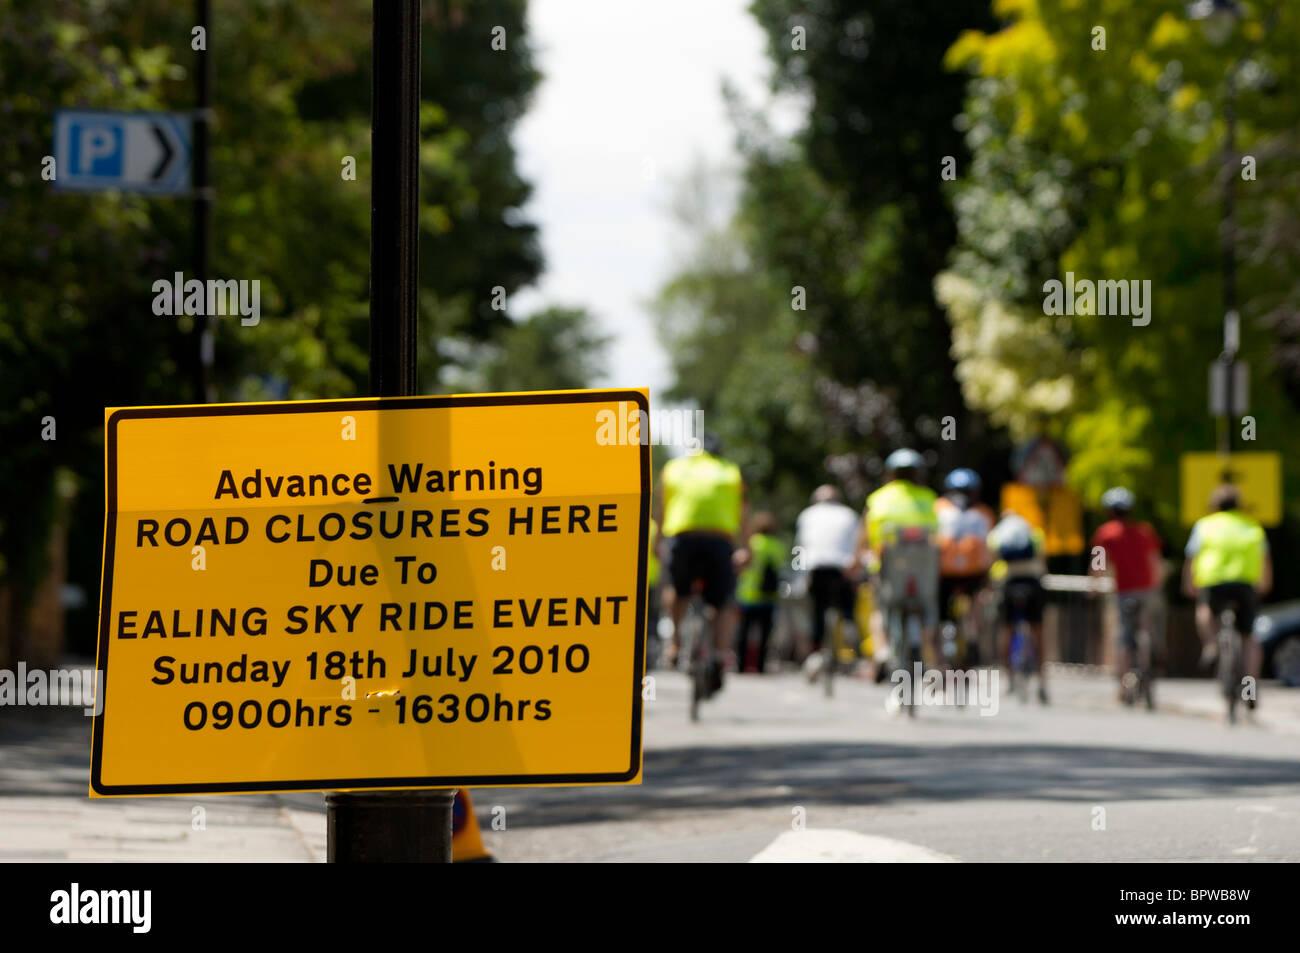 Road closure warning during Mayor of London's Sky Ride Ealing 2010, United Kingdom - Stock Image